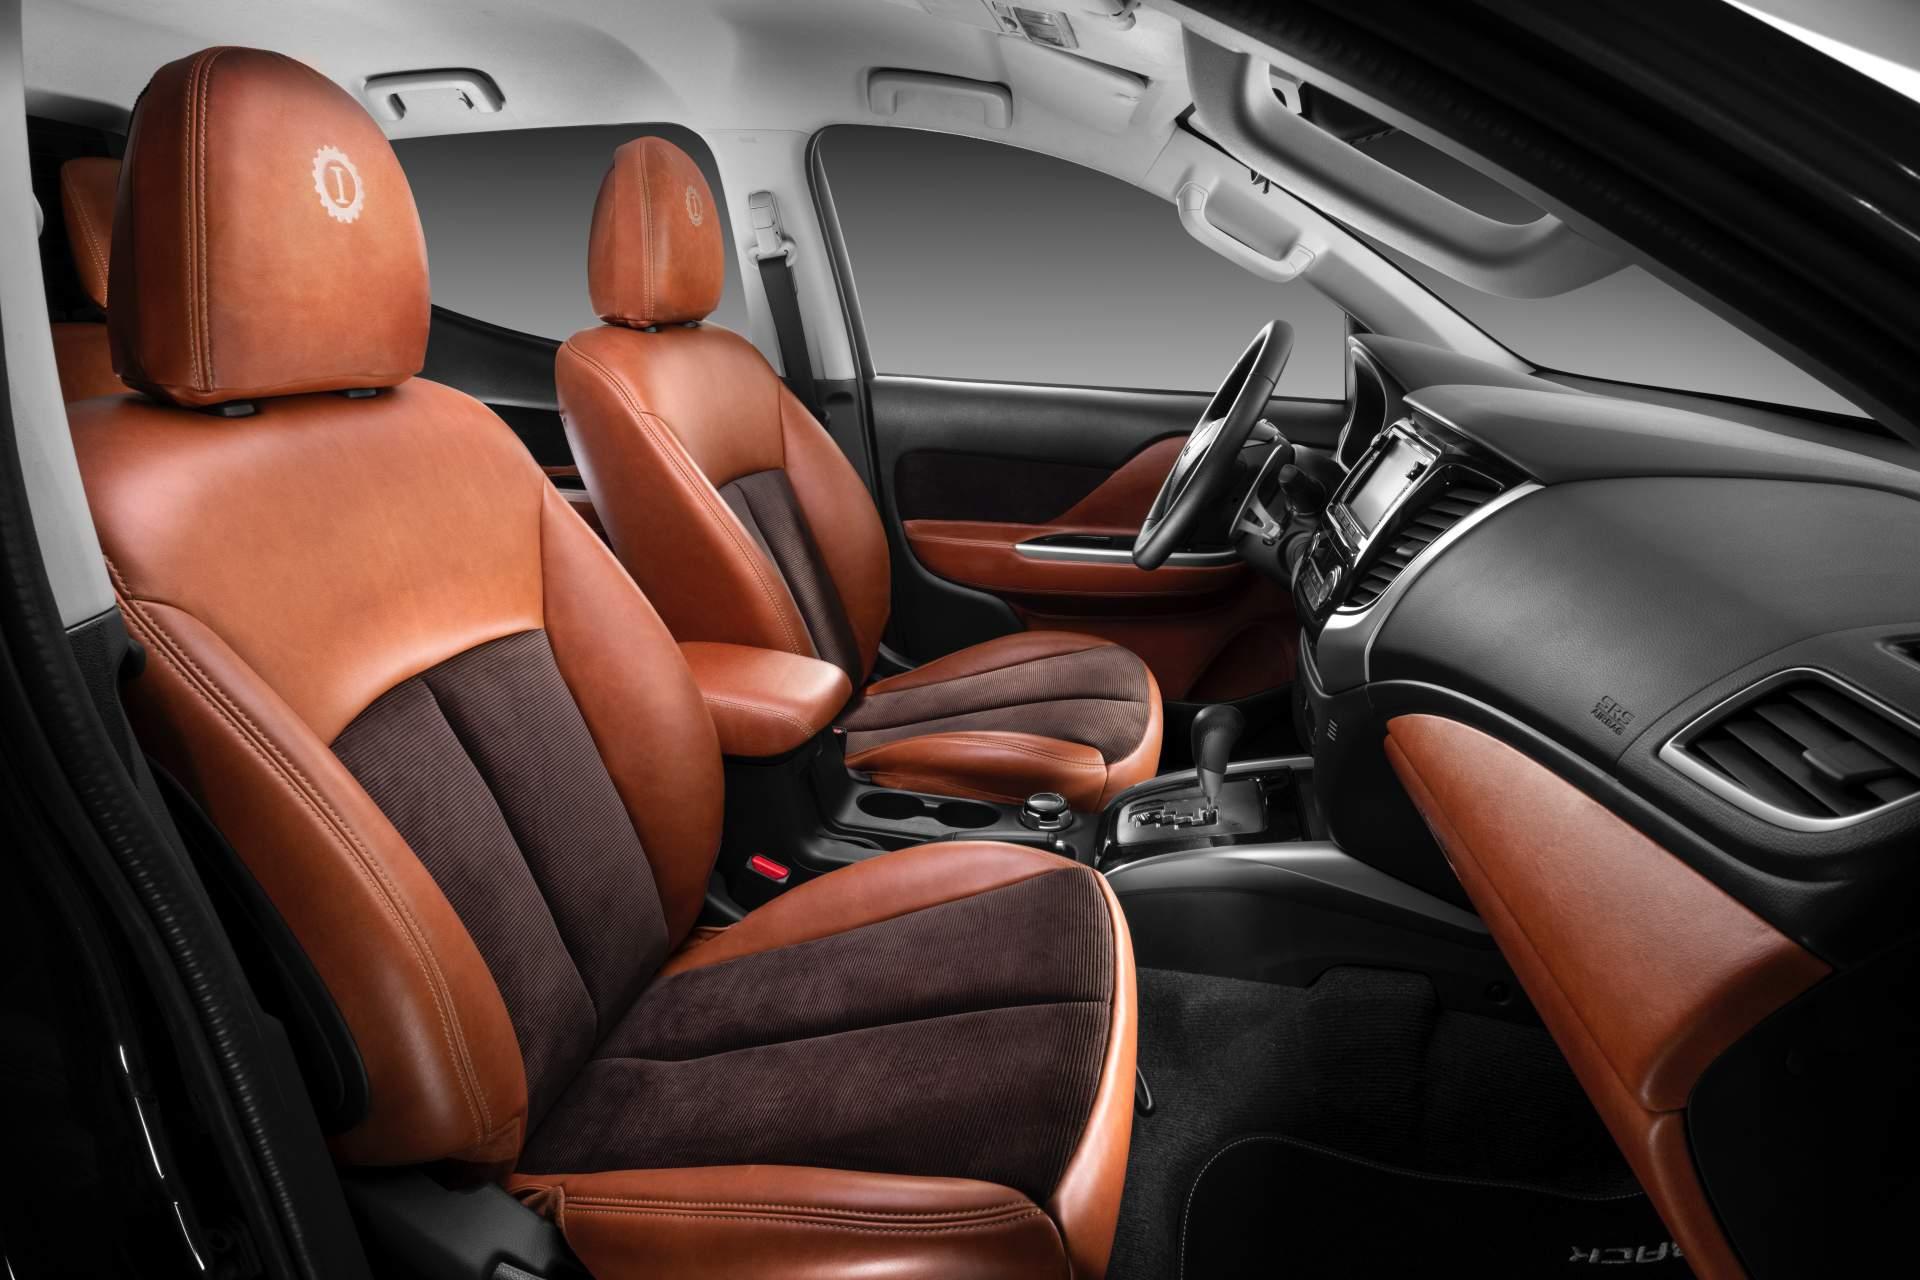 Fiat_Fullback_Cross_Concept_by_Garage_Italia_Customs_0005